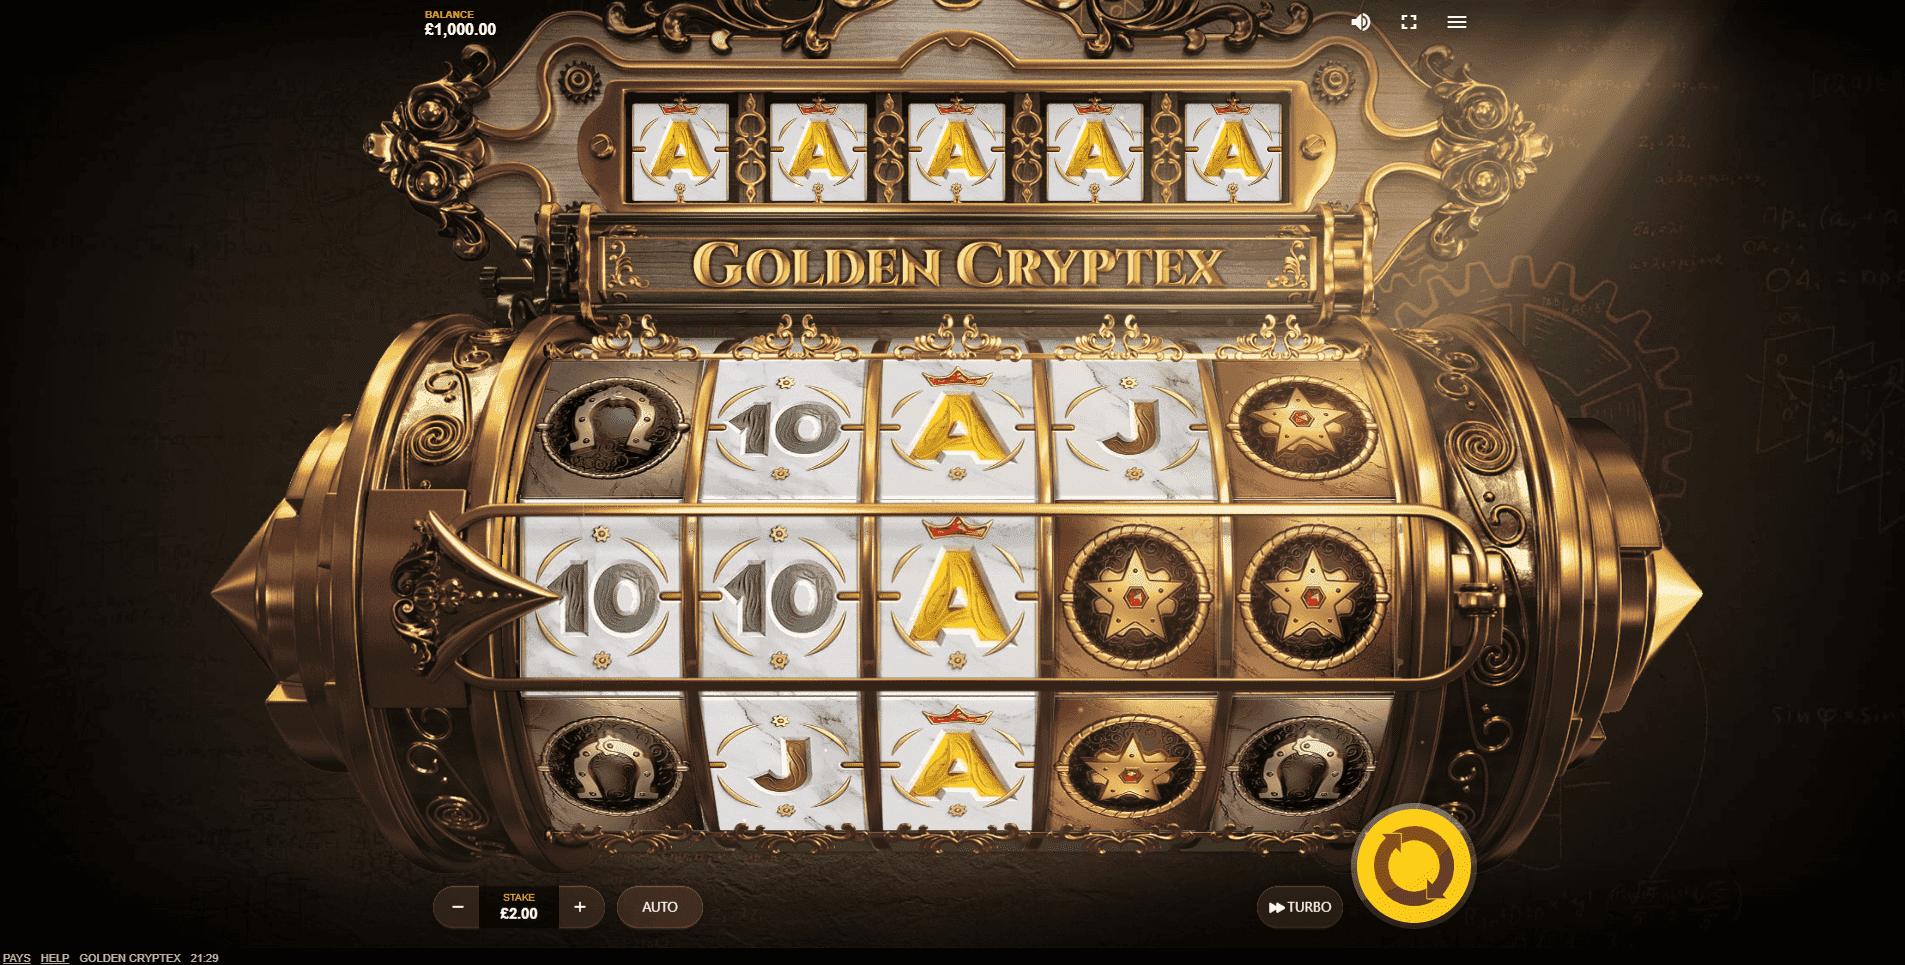 Golden Cryptex slot machine screenshot